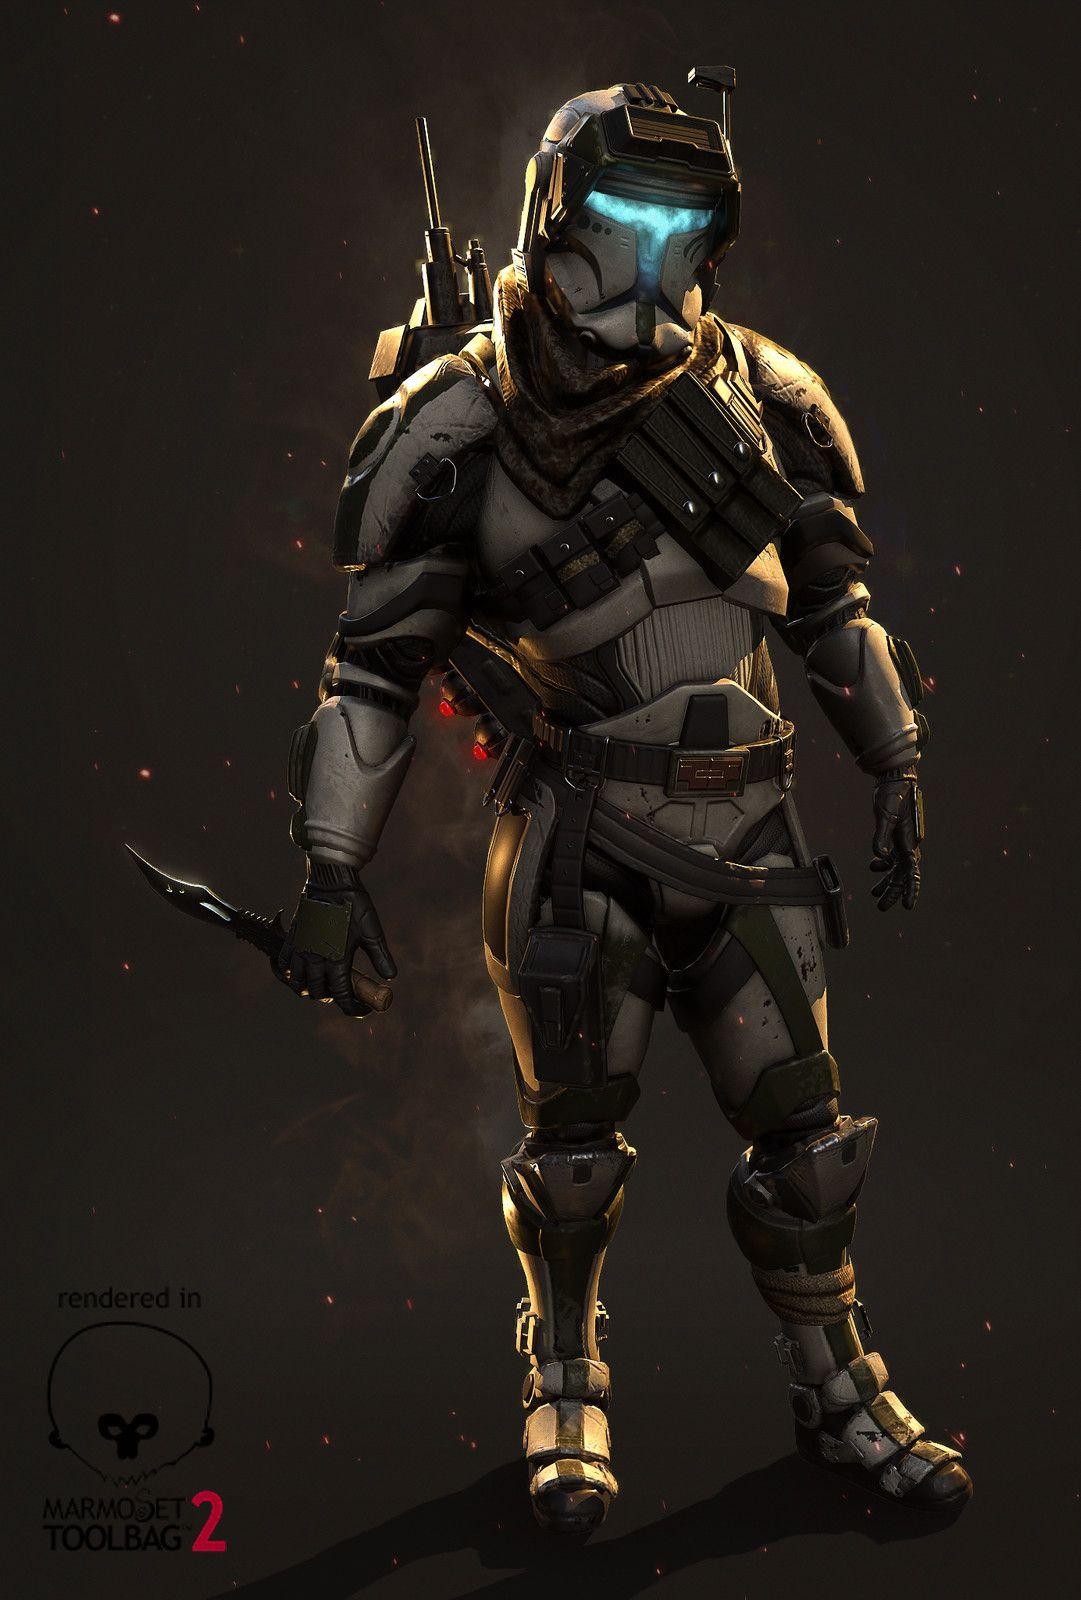 Pin By Gabe Negrete On Star Wars Pinterest Republic Commando